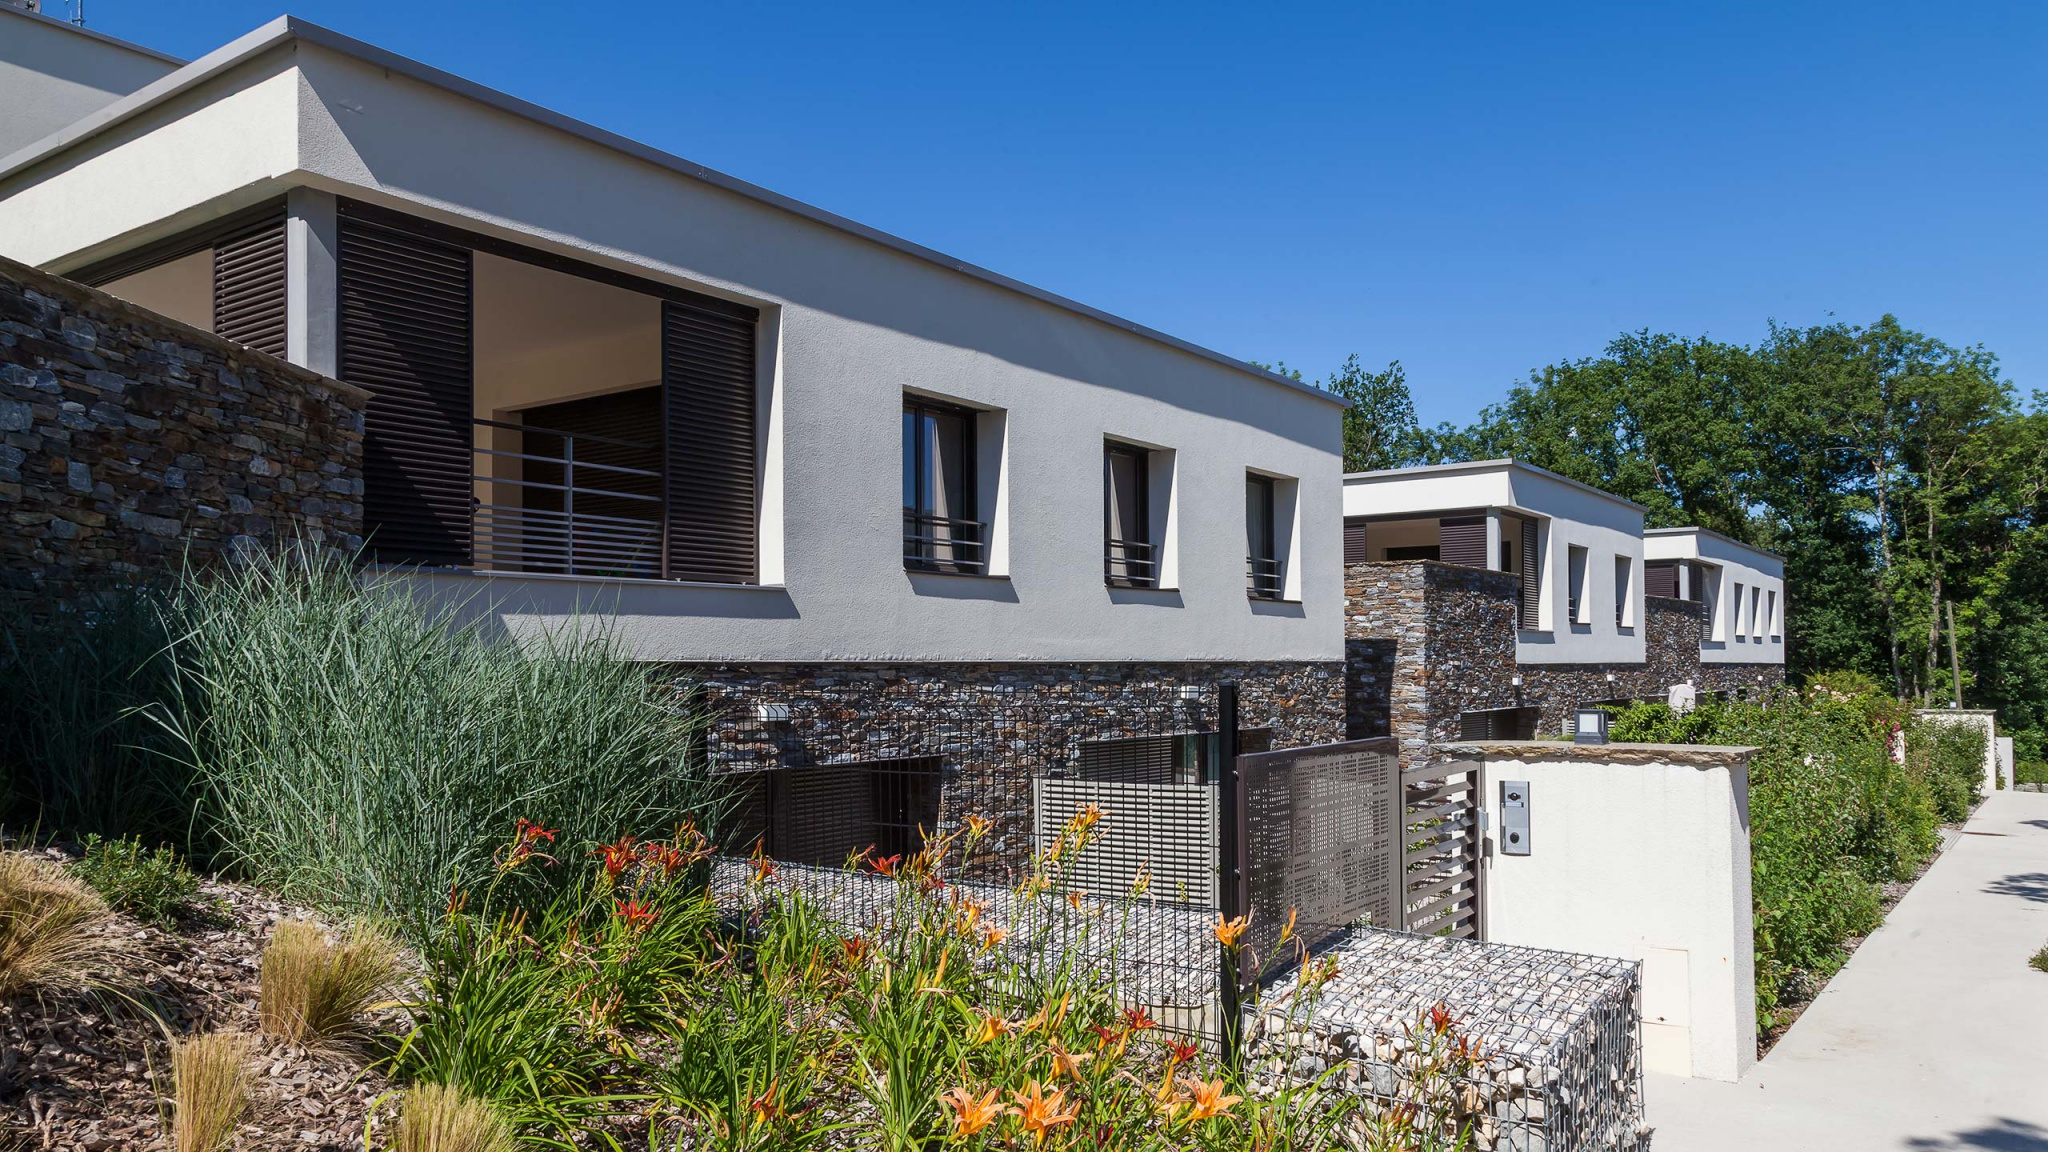 Proche Genève, immobilier neuf